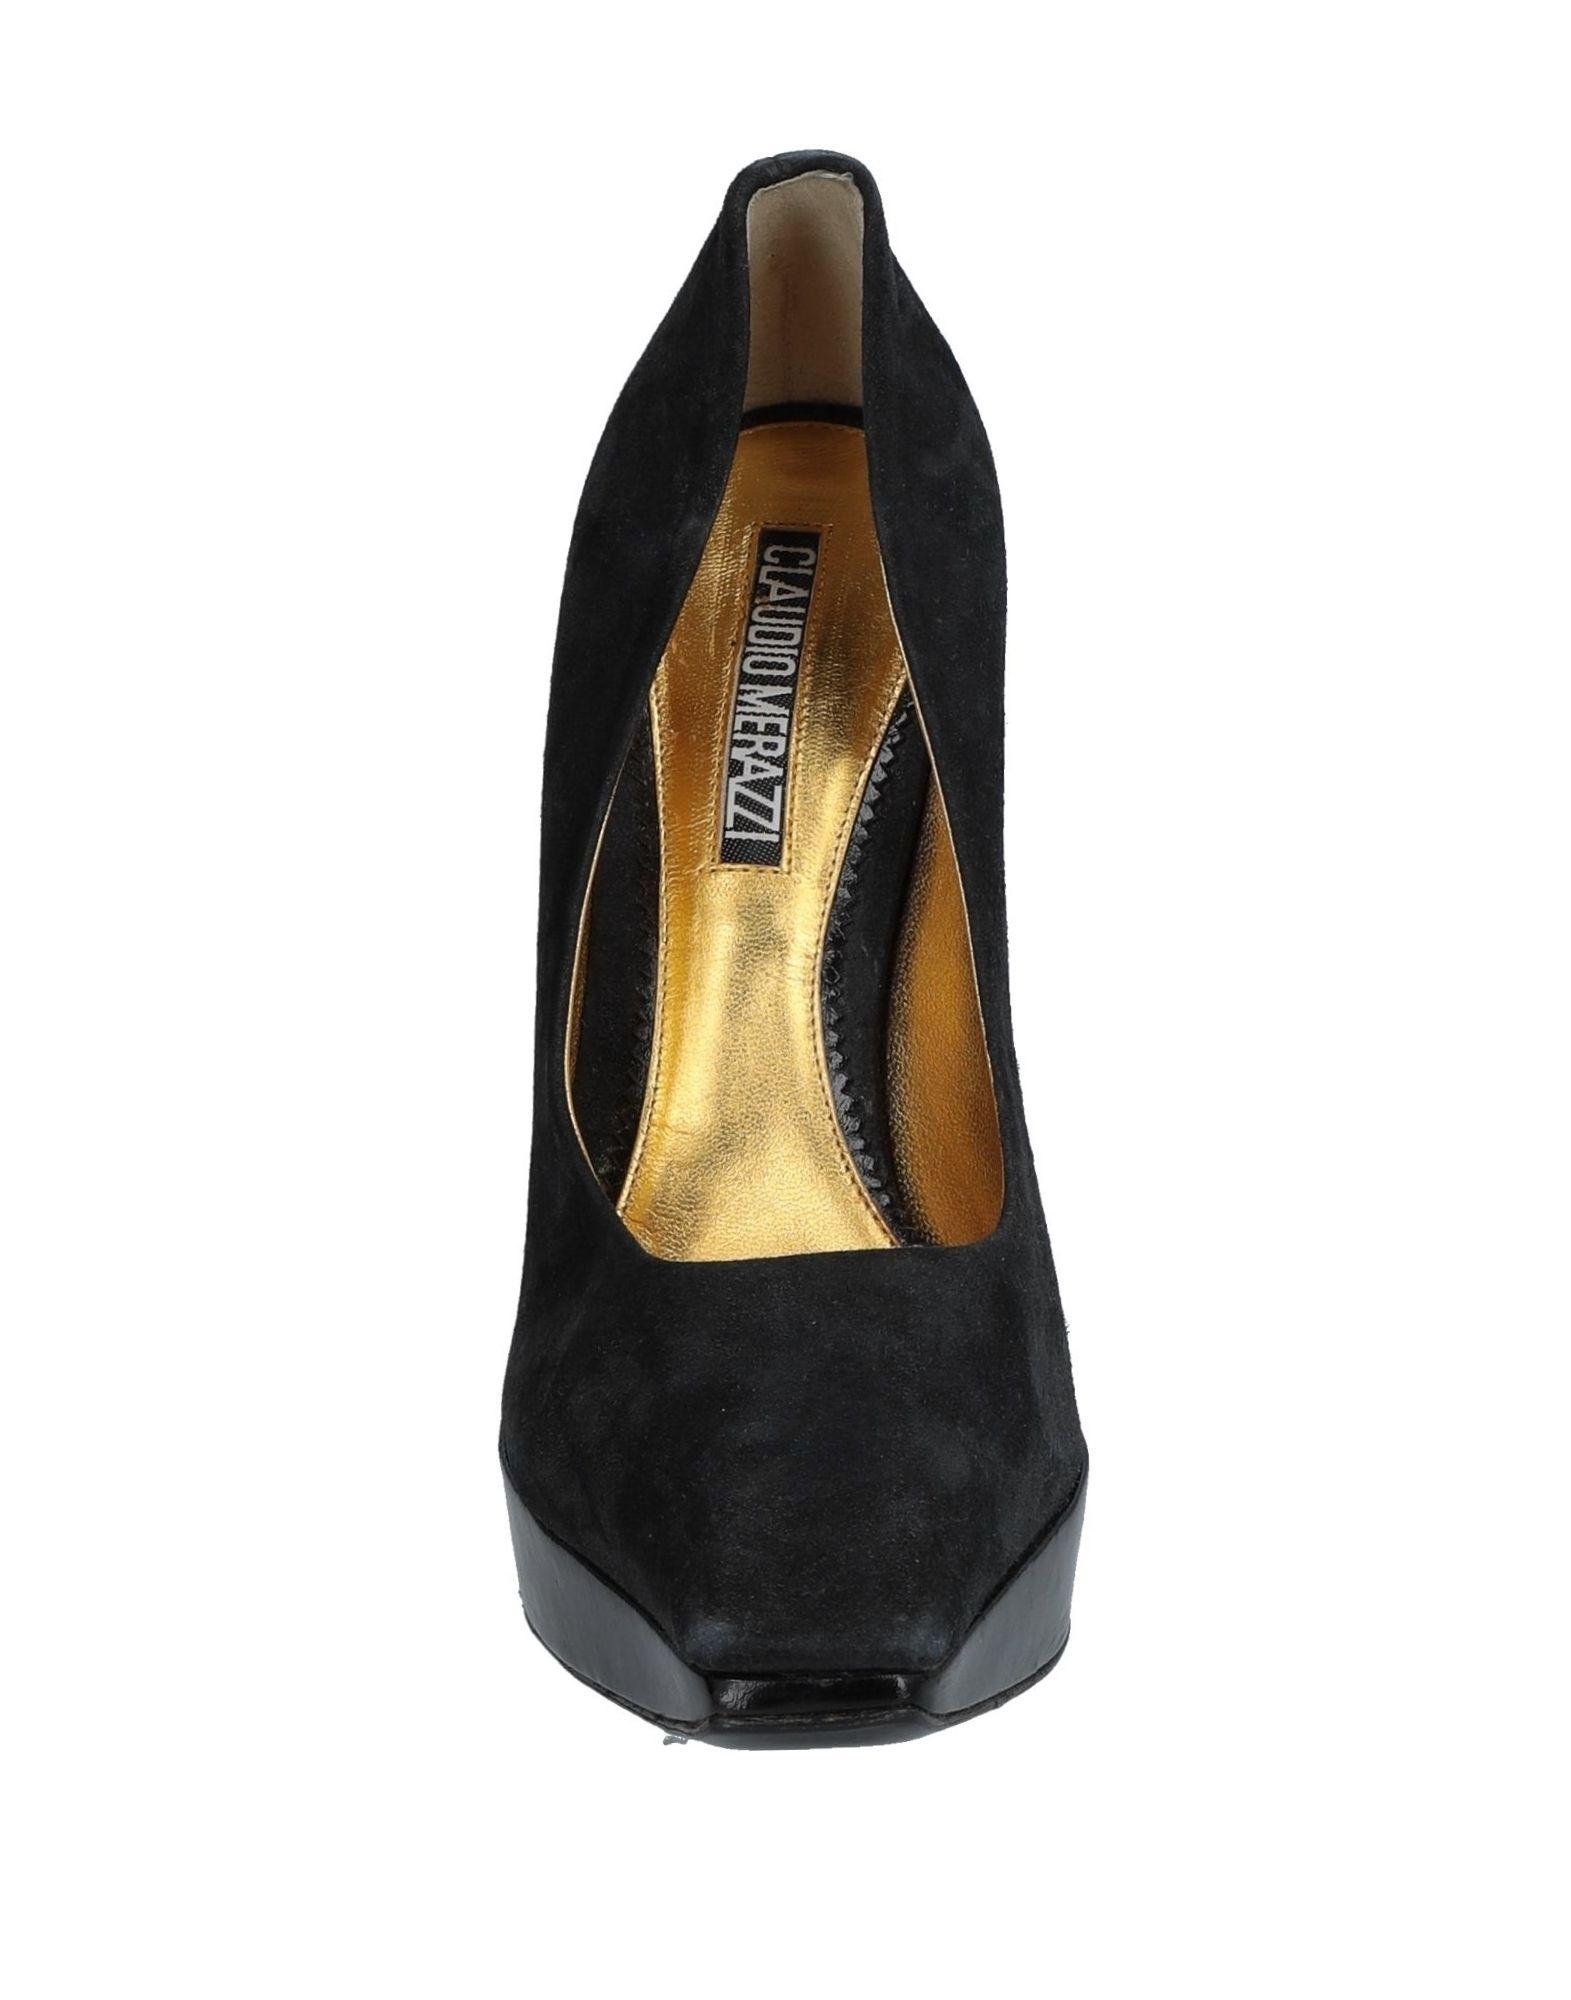 Stilvolle billige Schuhe Damen Claudio Merazzi Pumps Damen Schuhe  11536061TK dc9c3f